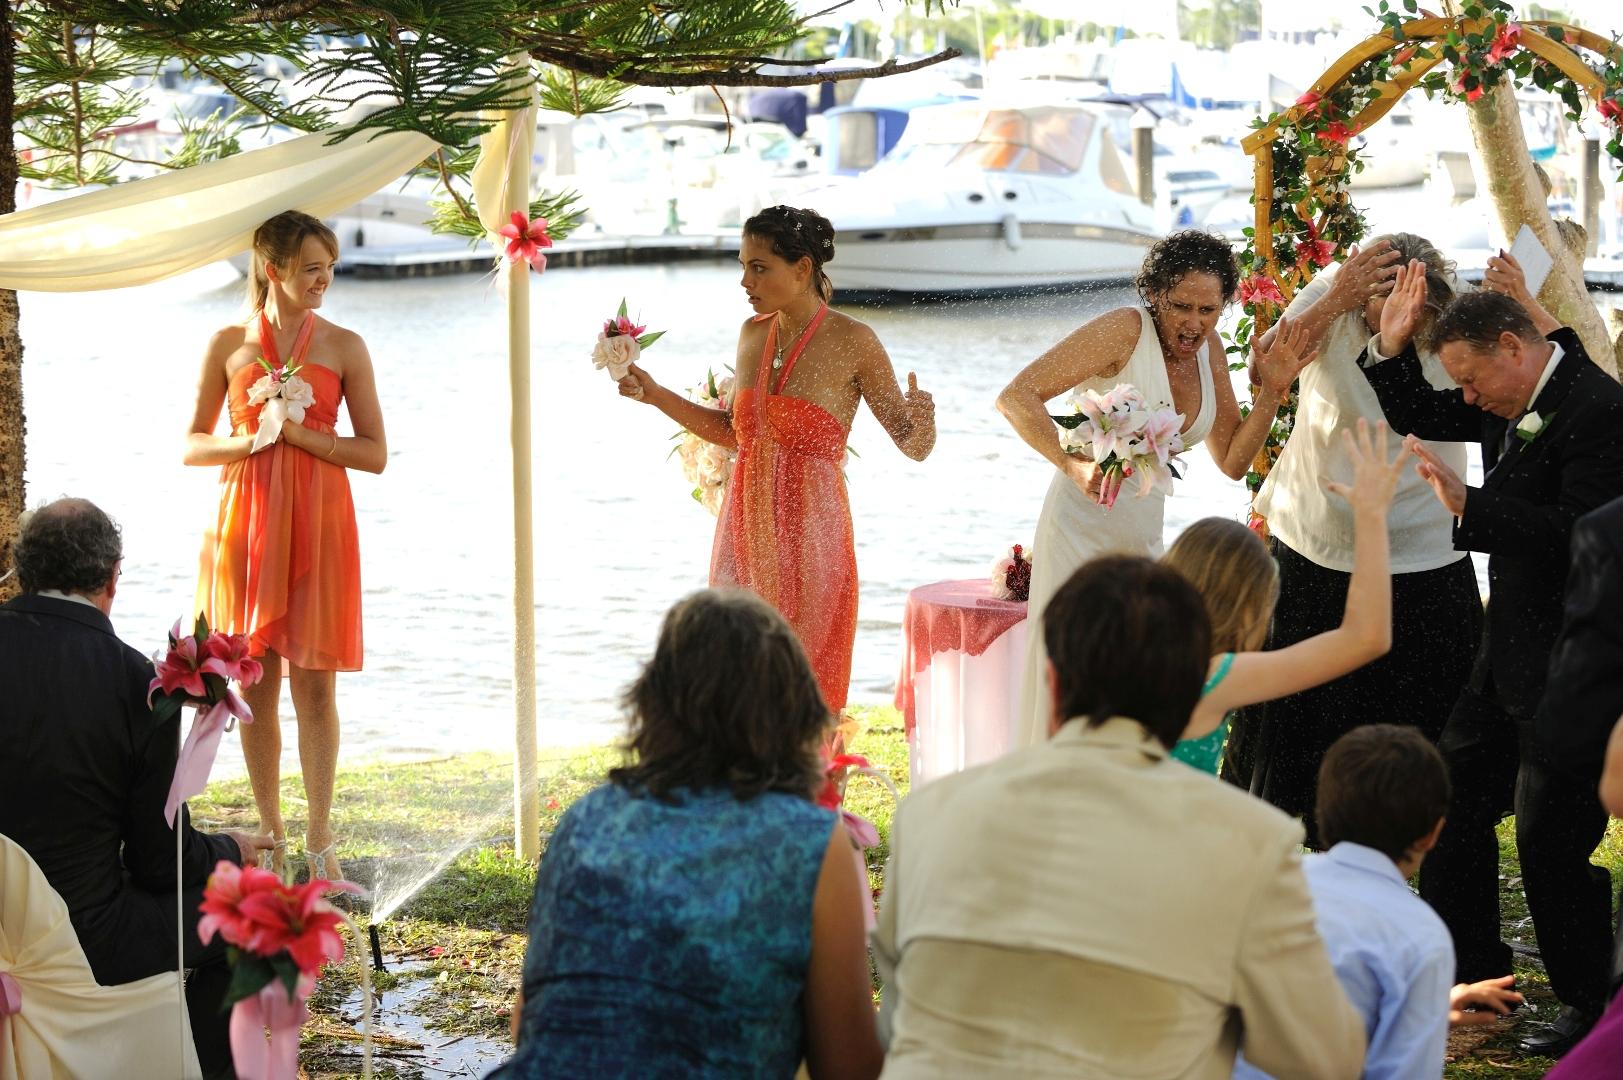 File:Wedding Sprinkler.jpg